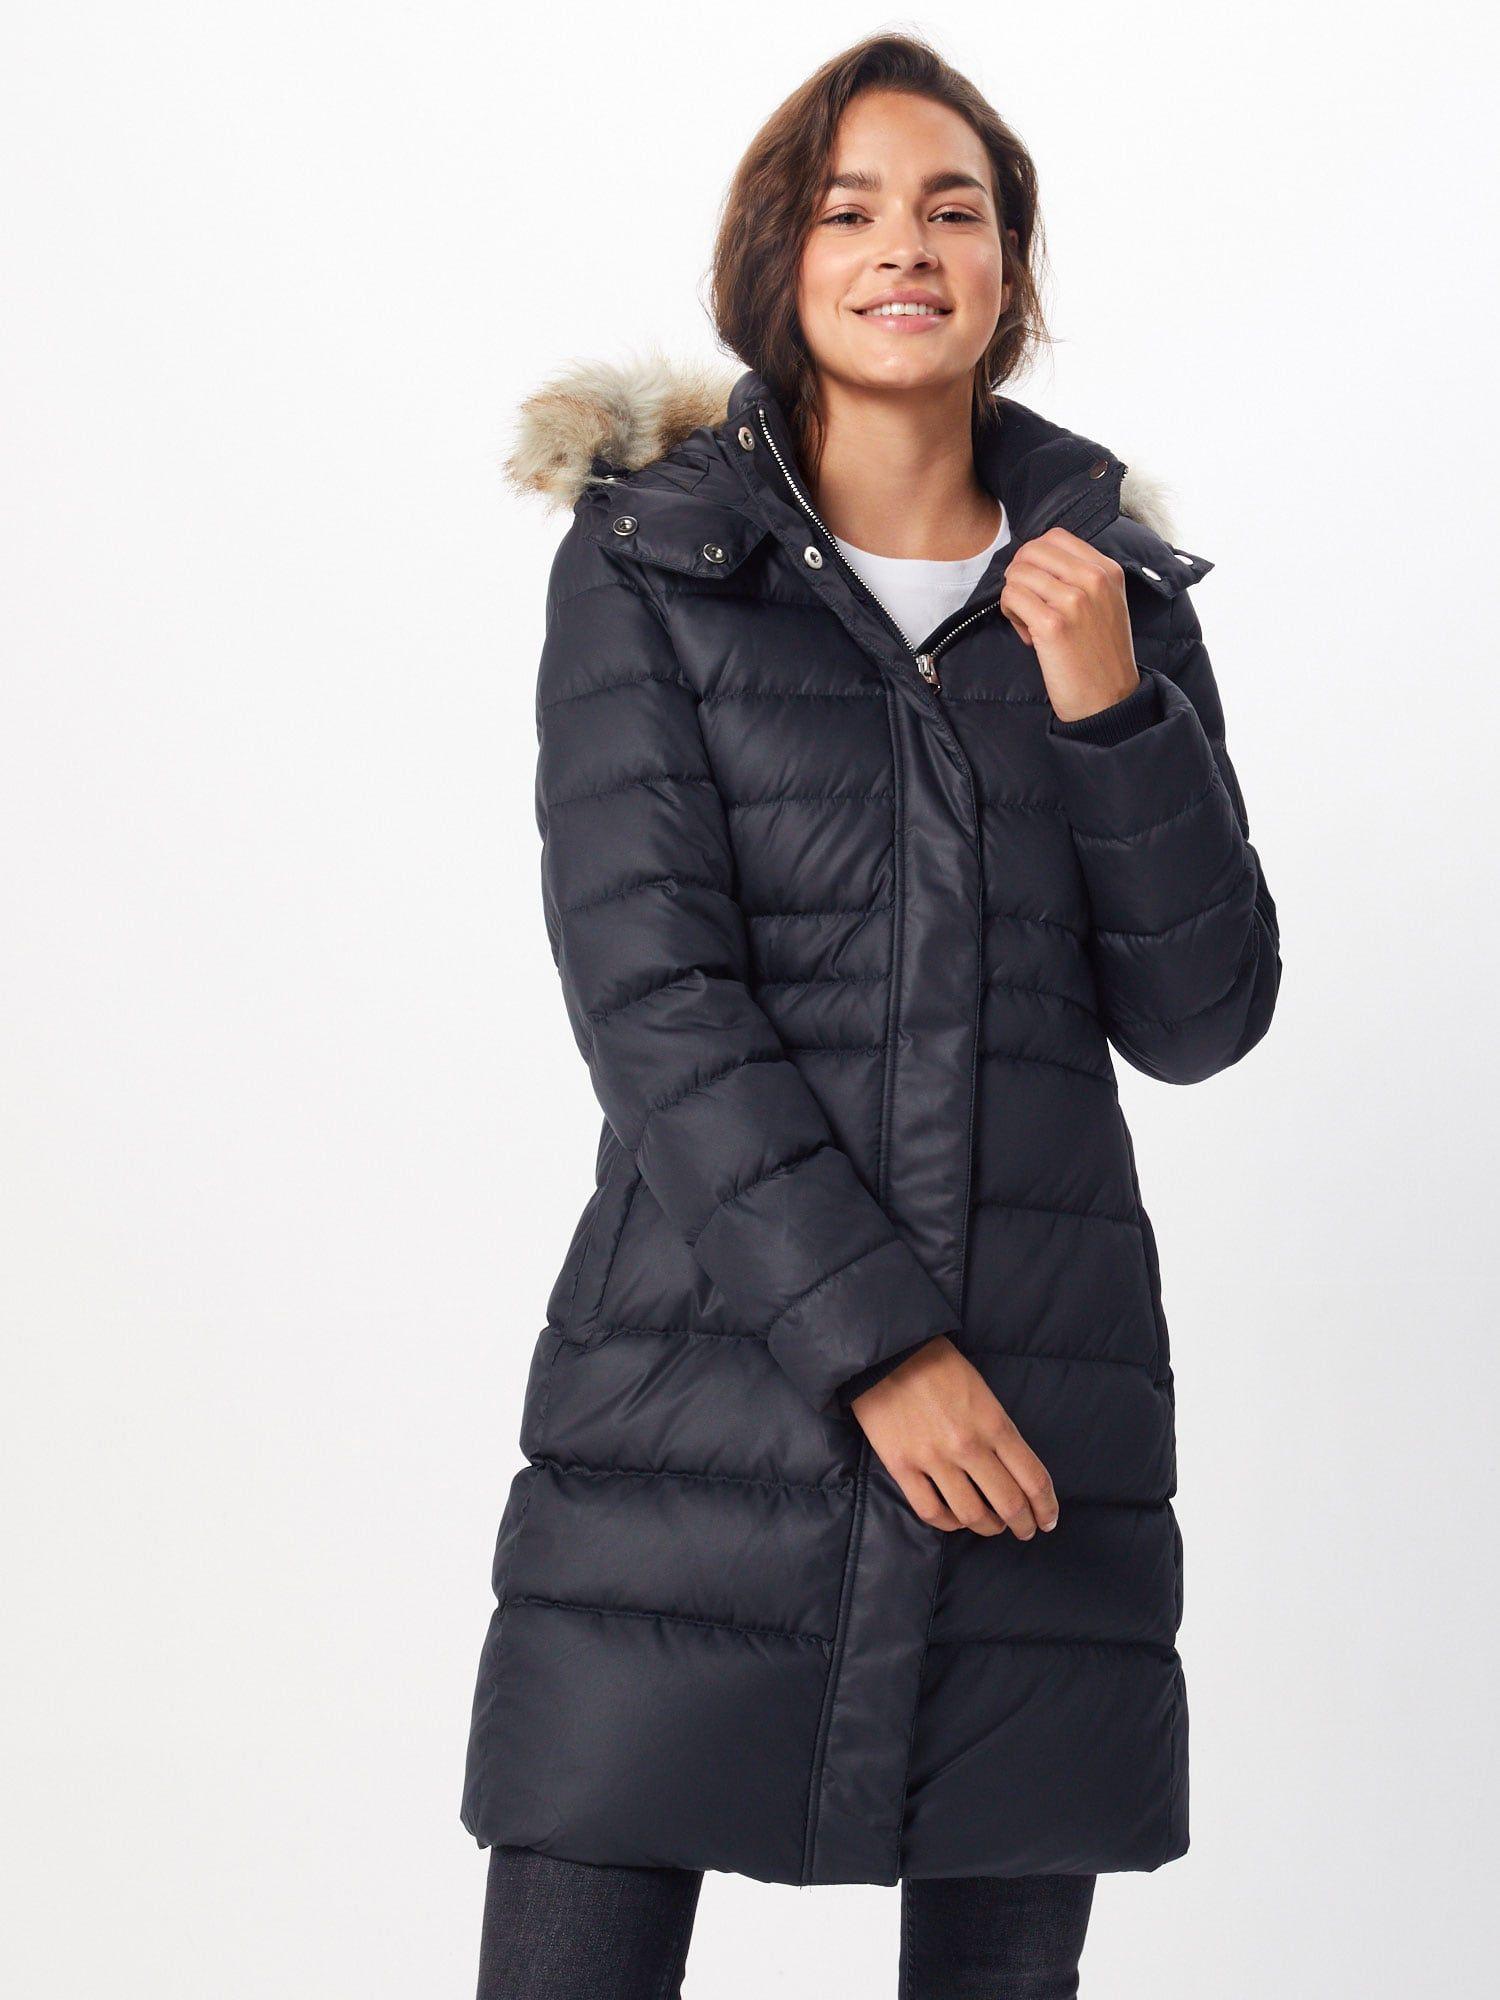 Calvin Klein Mantel Damen Schwarz Grosse Xs Mantel Damen Mantel Und Damen